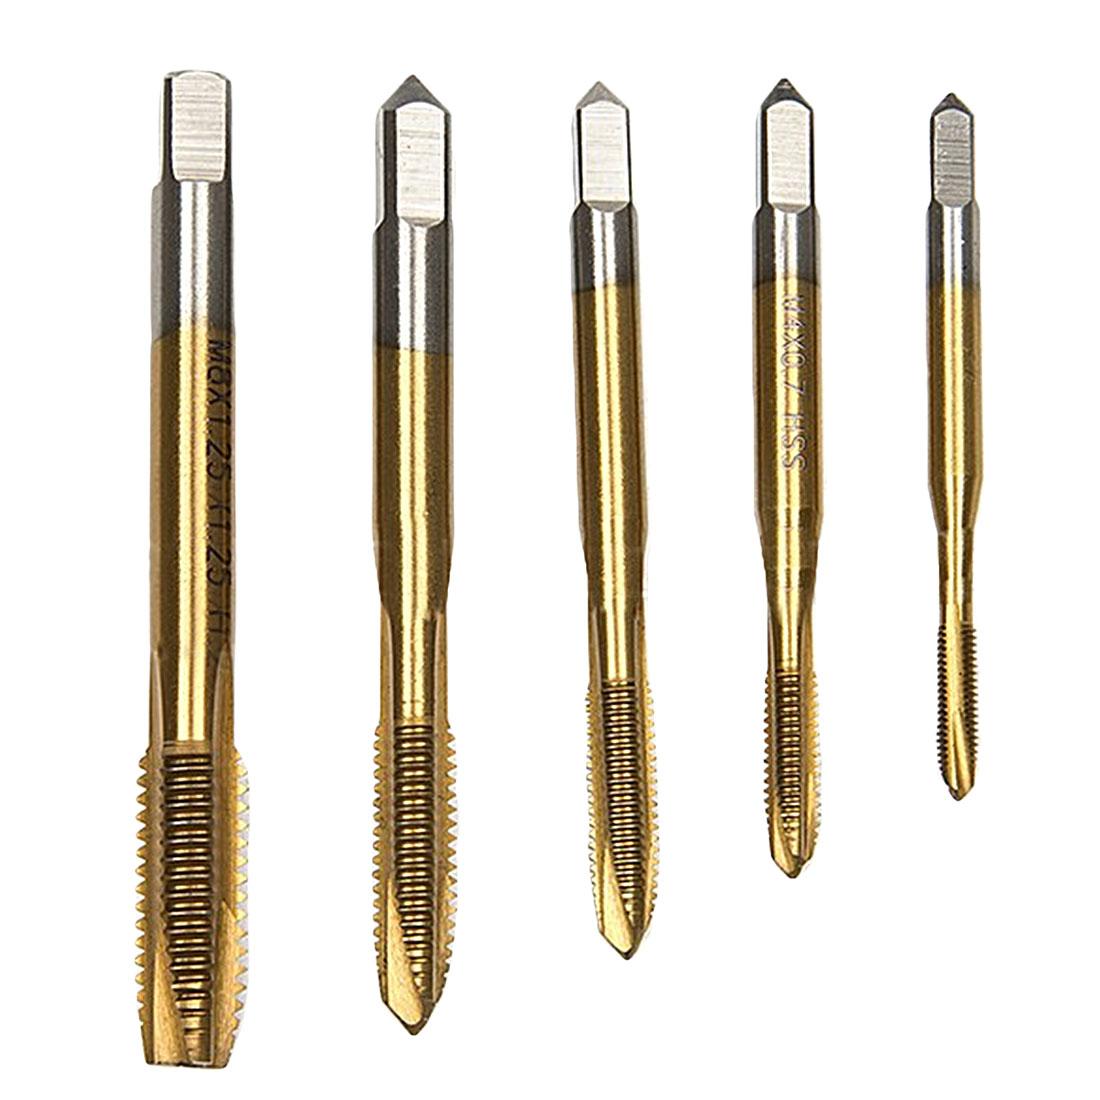 5pcs/set Titanium Coated Thread Tap Drill Metric Hss Die M3 M4 M5 M6 M8 Spiral Point Thread Plug Handle Taps Die Set